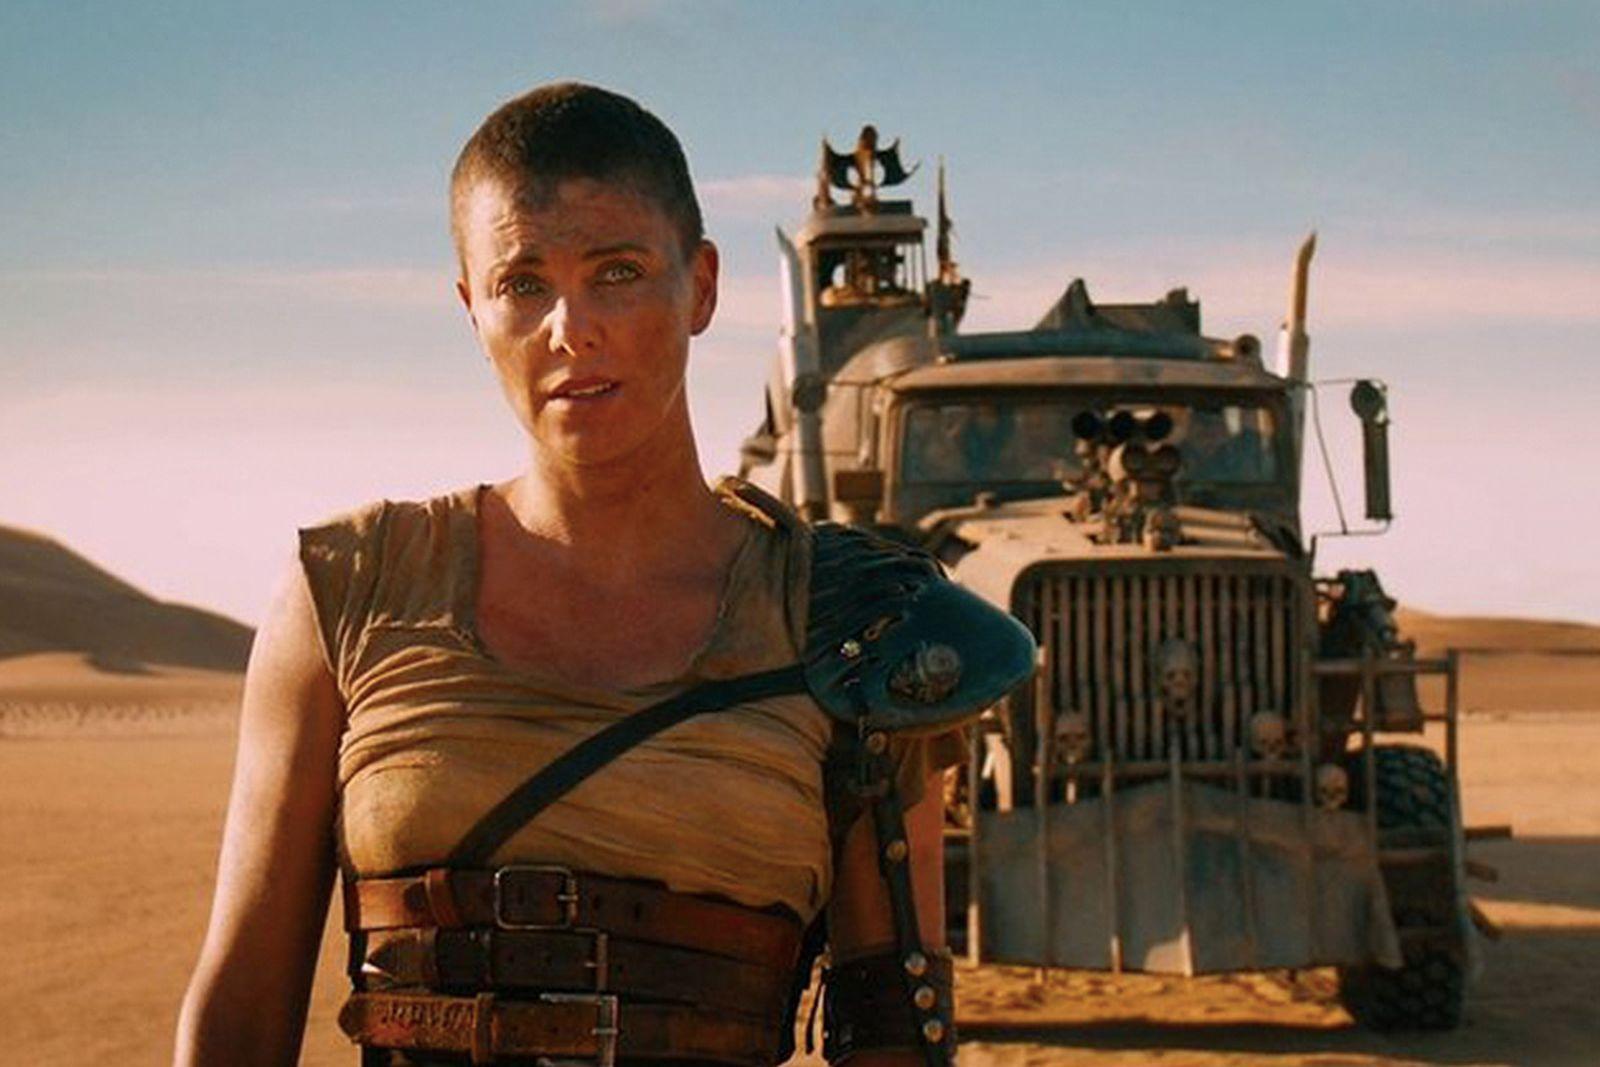 Furiosa in 'Mad Max: Fury Road' Desert Scene